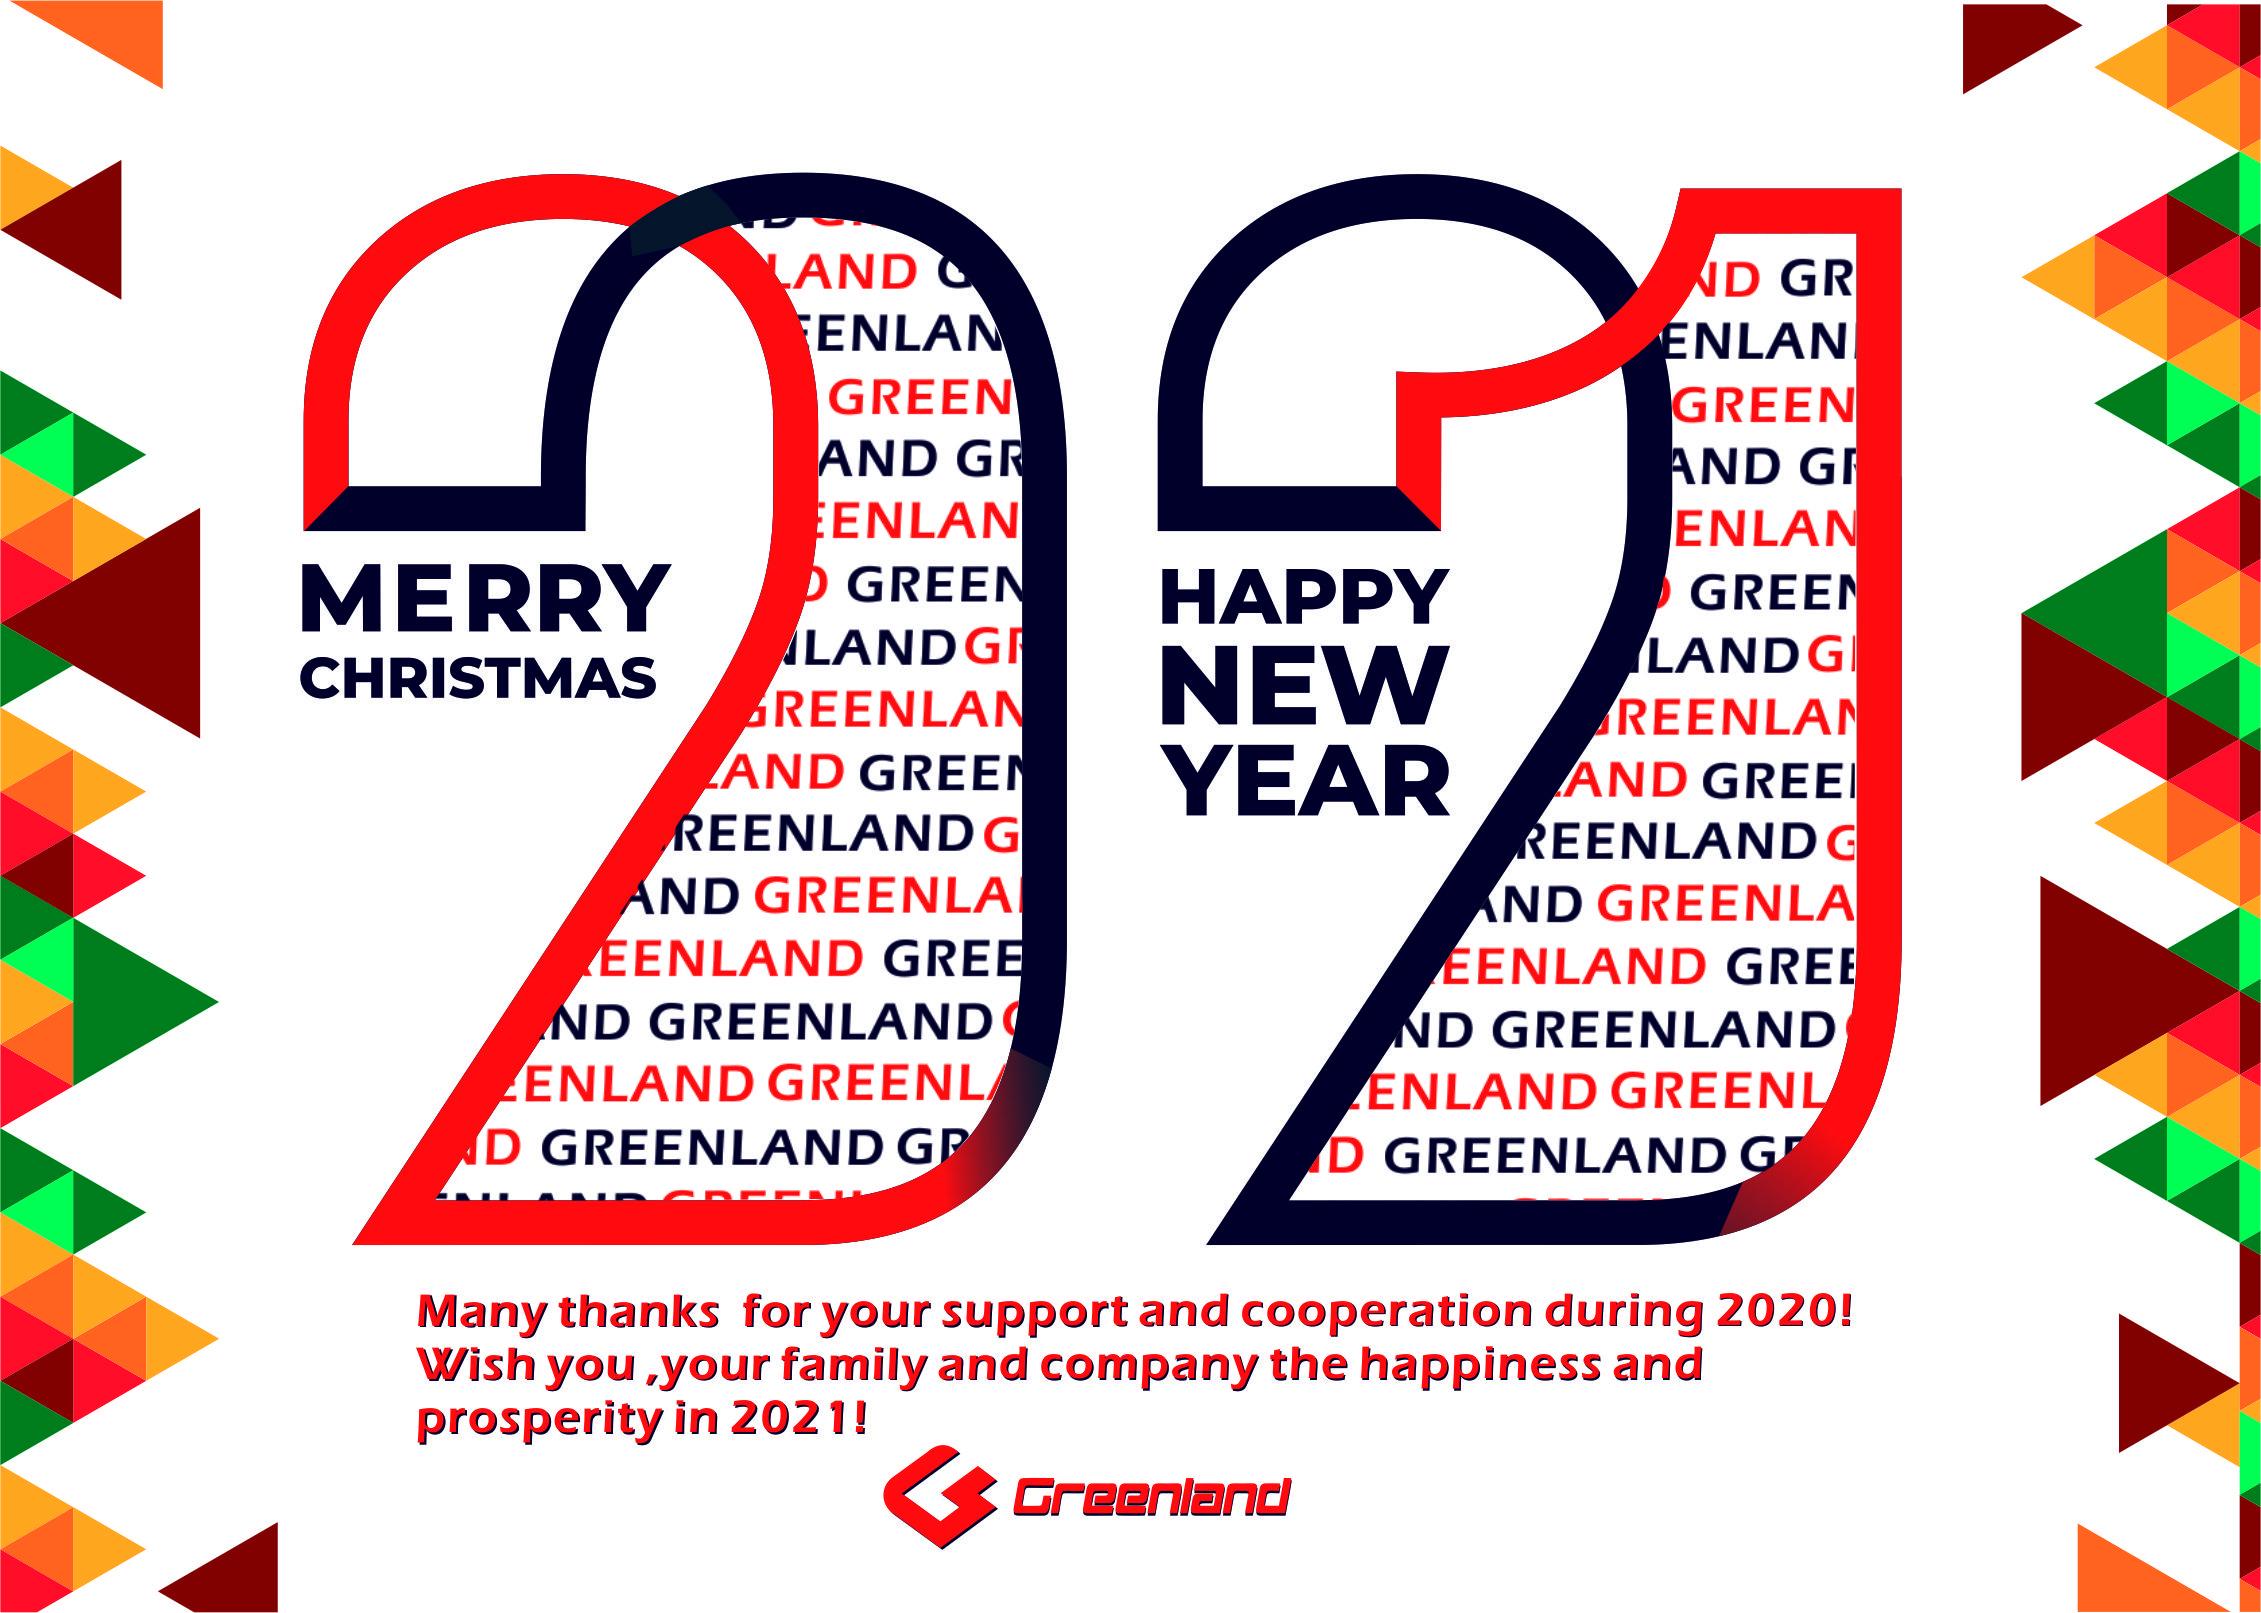 Merry Chritmas & Happy New Year!